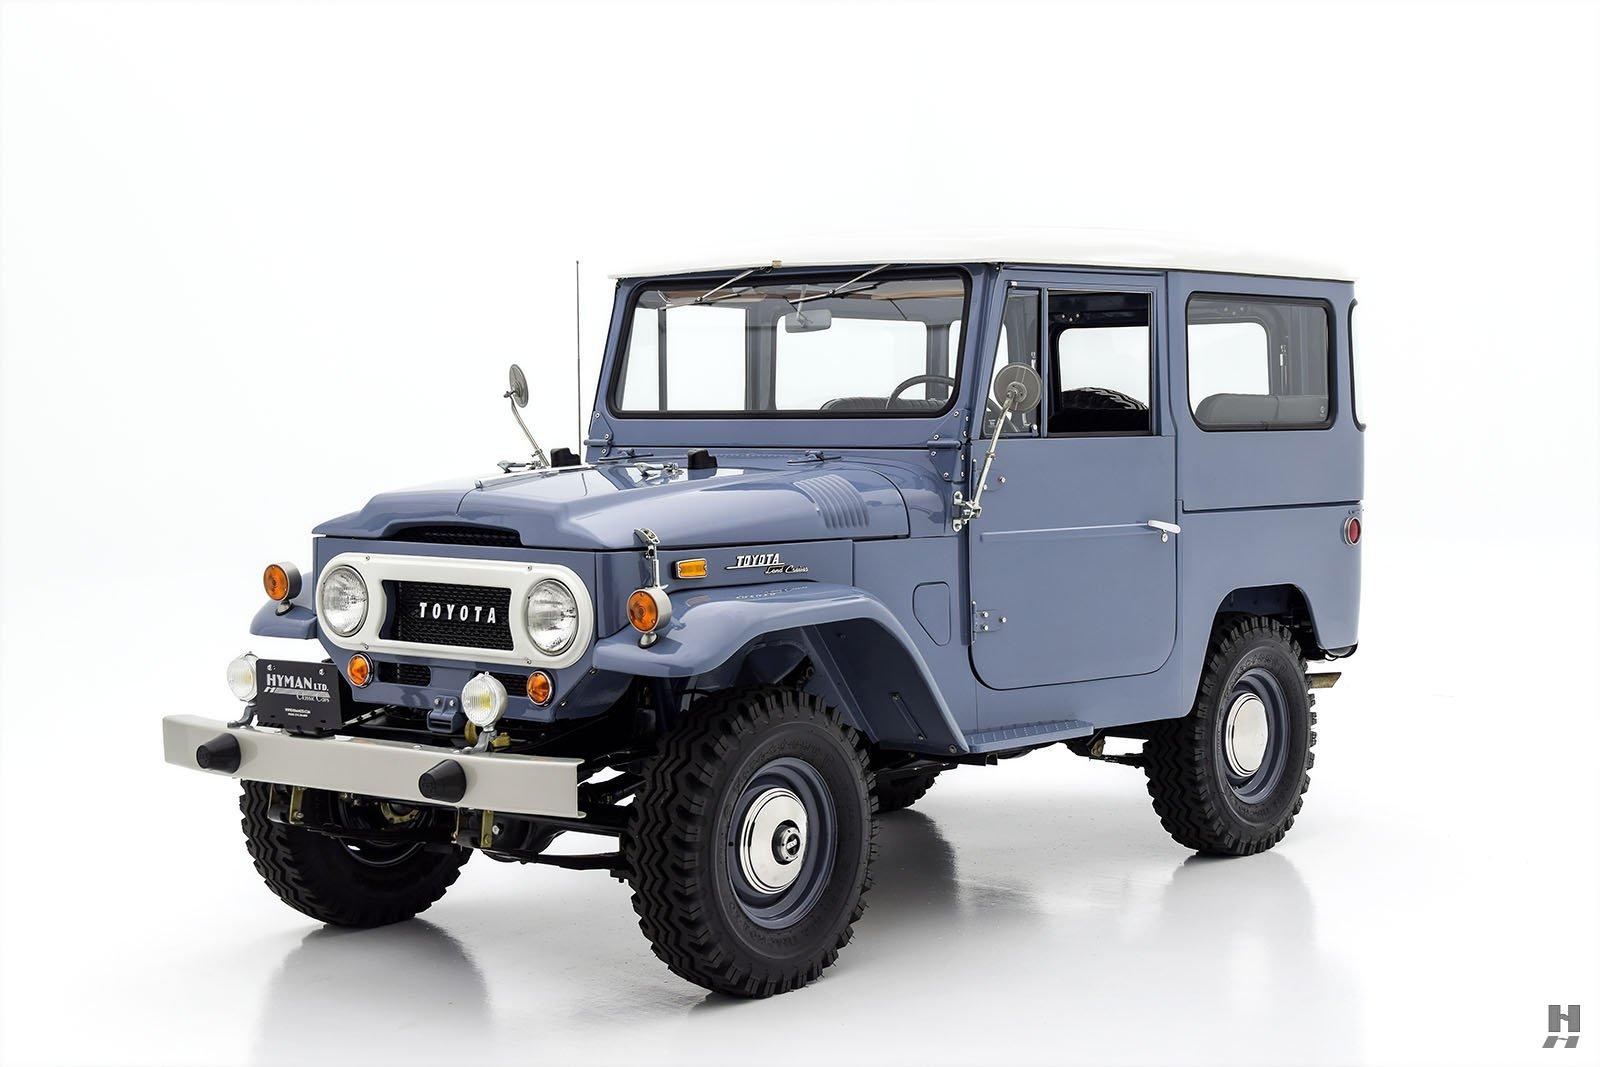 1968 toyota fj40 land cruiser for sale classic cars hyman ltd. Black Bedroom Furniture Sets. Home Design Ideas